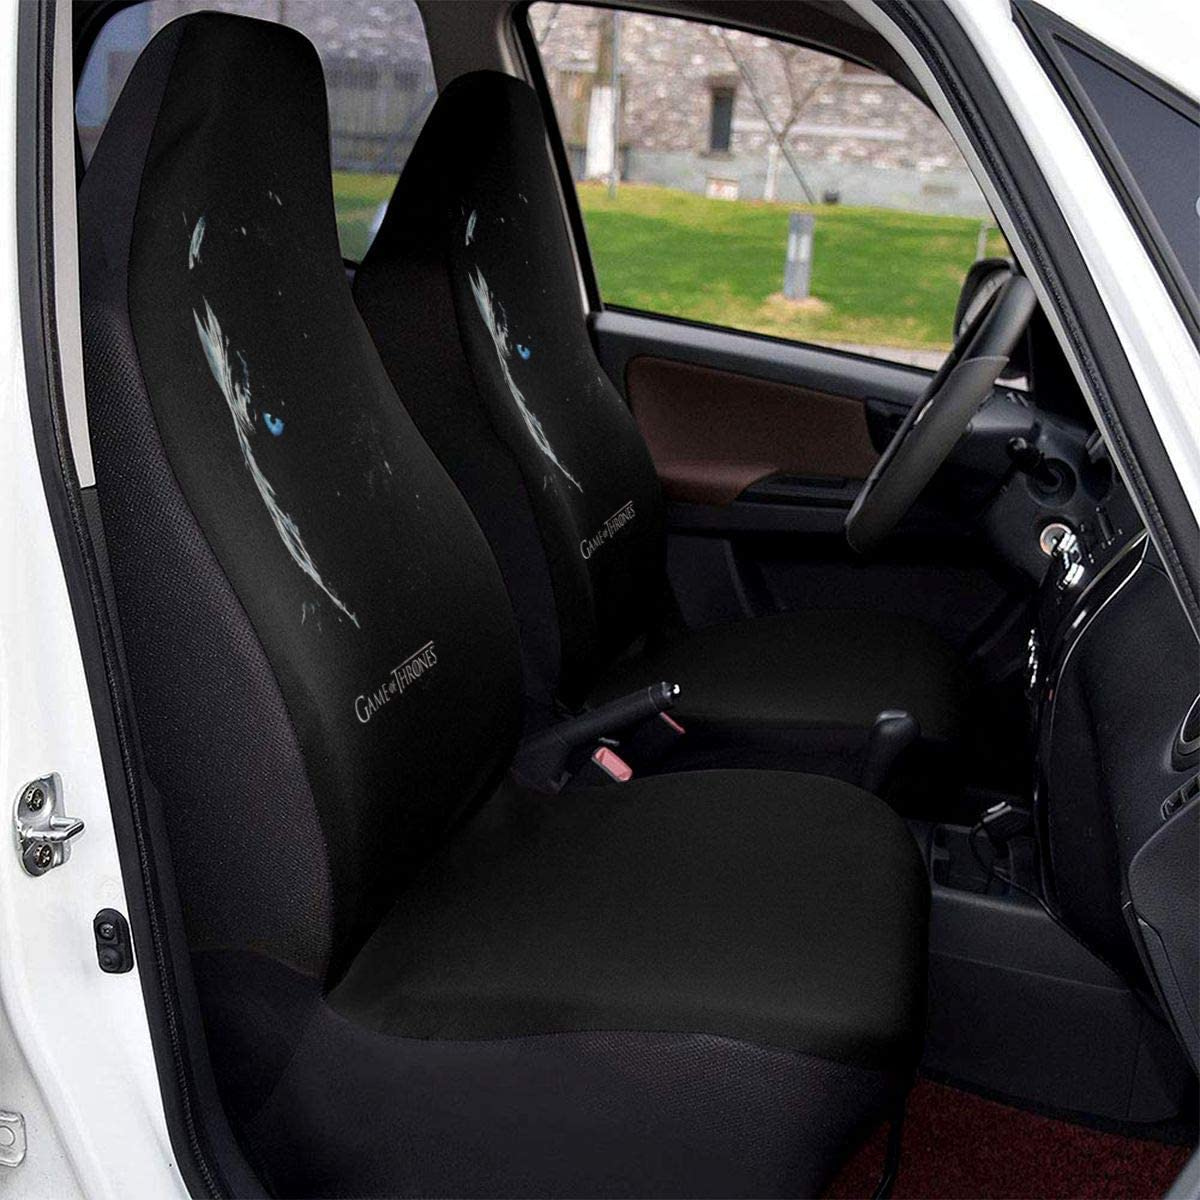 StarW Game of Thrones Night King Autositzbezug Insgesamt umgeben Universal Fit Autositzbezug 1PCS /& Acirc;